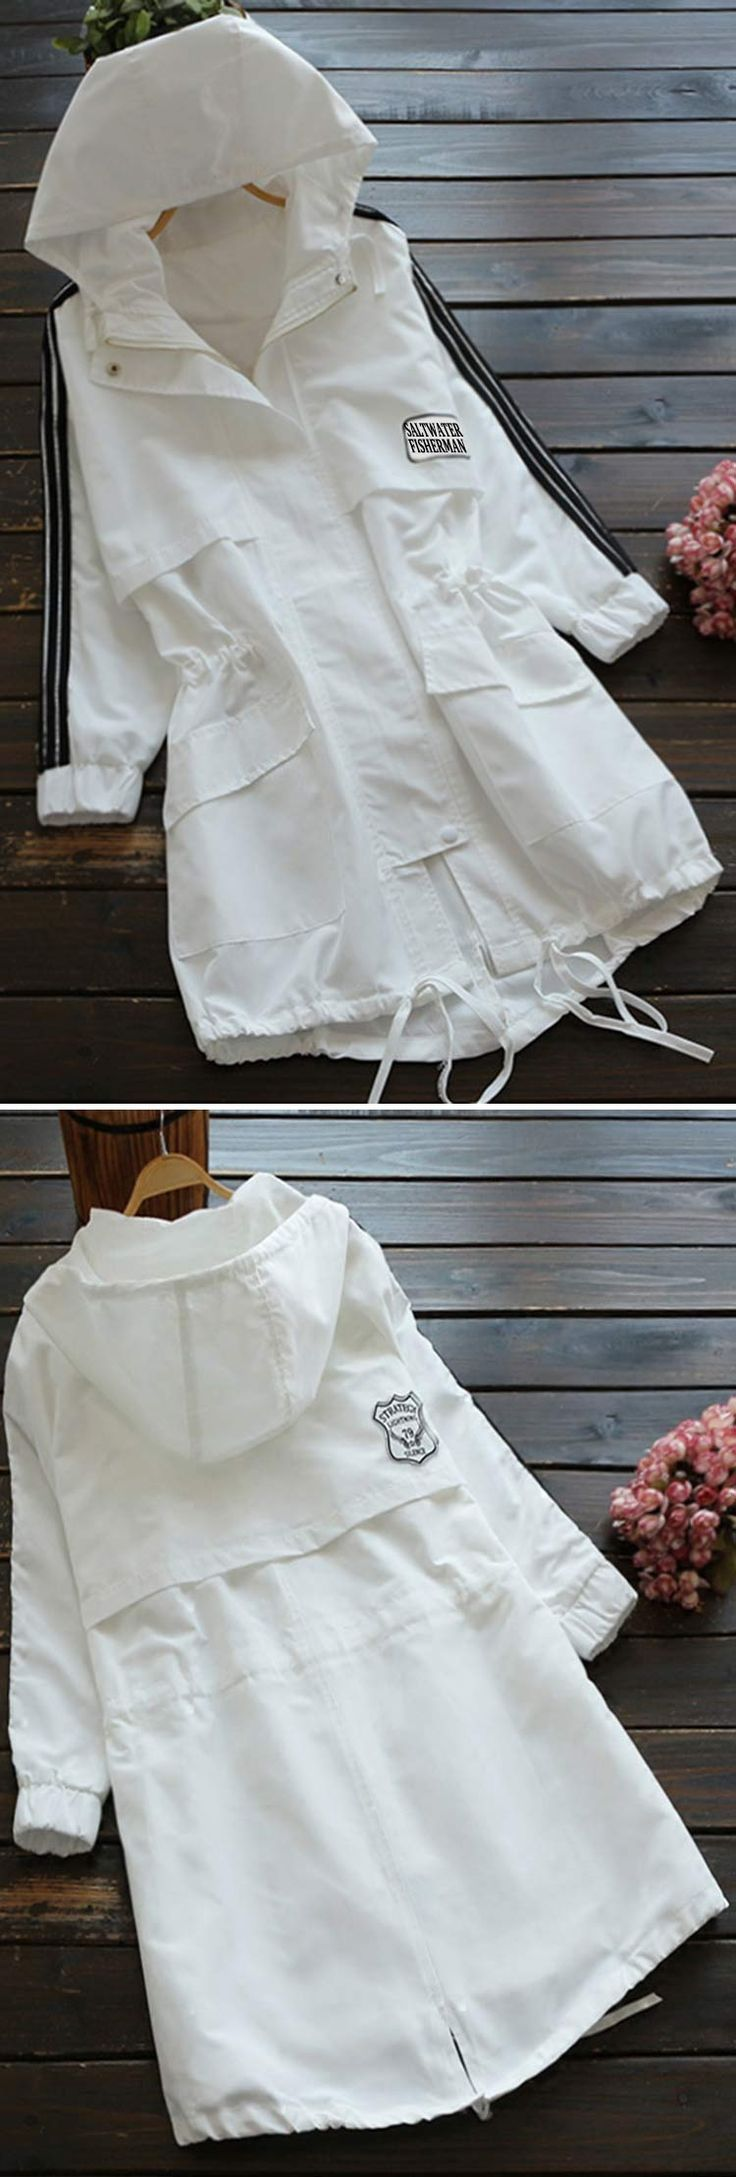 87 best Chompas images on Pinterest | Sweatshirts, Clothing apparel ...